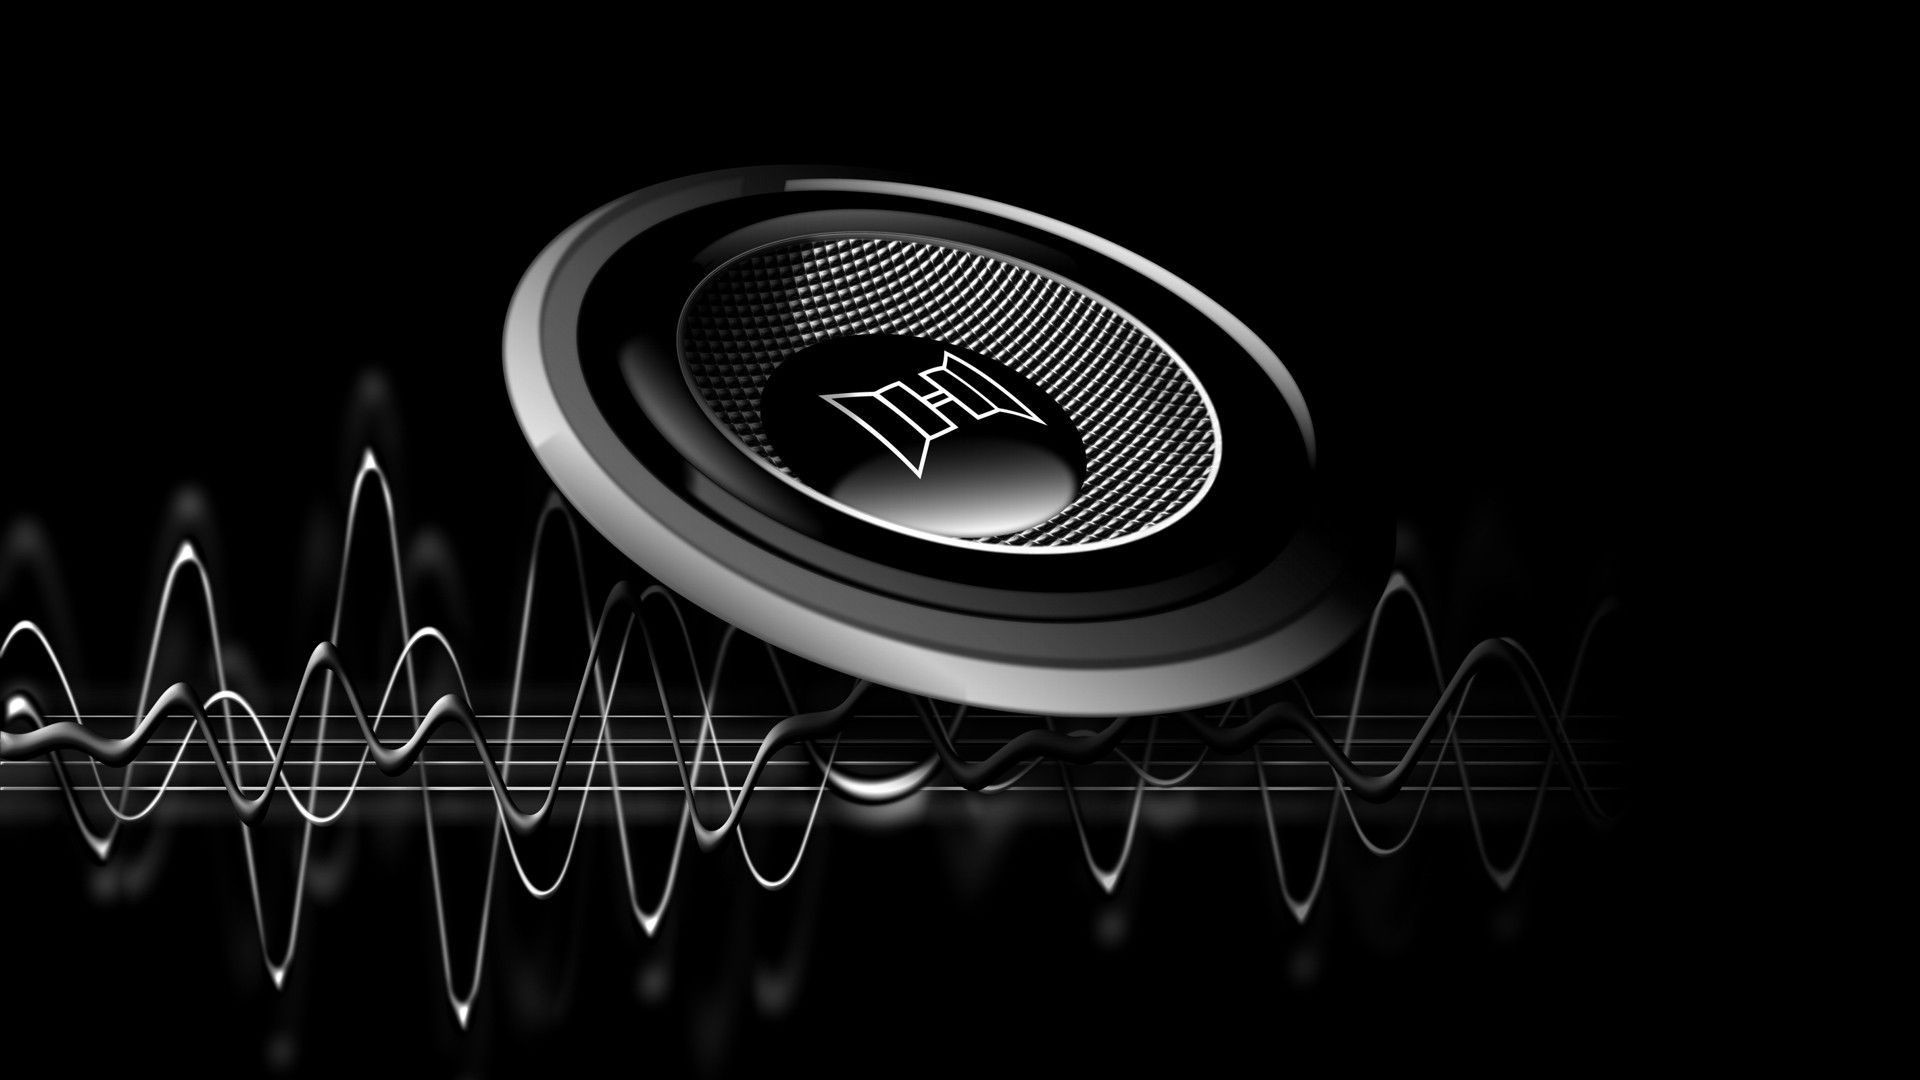 Music Recording Studio HD Wallpaper 74 Images